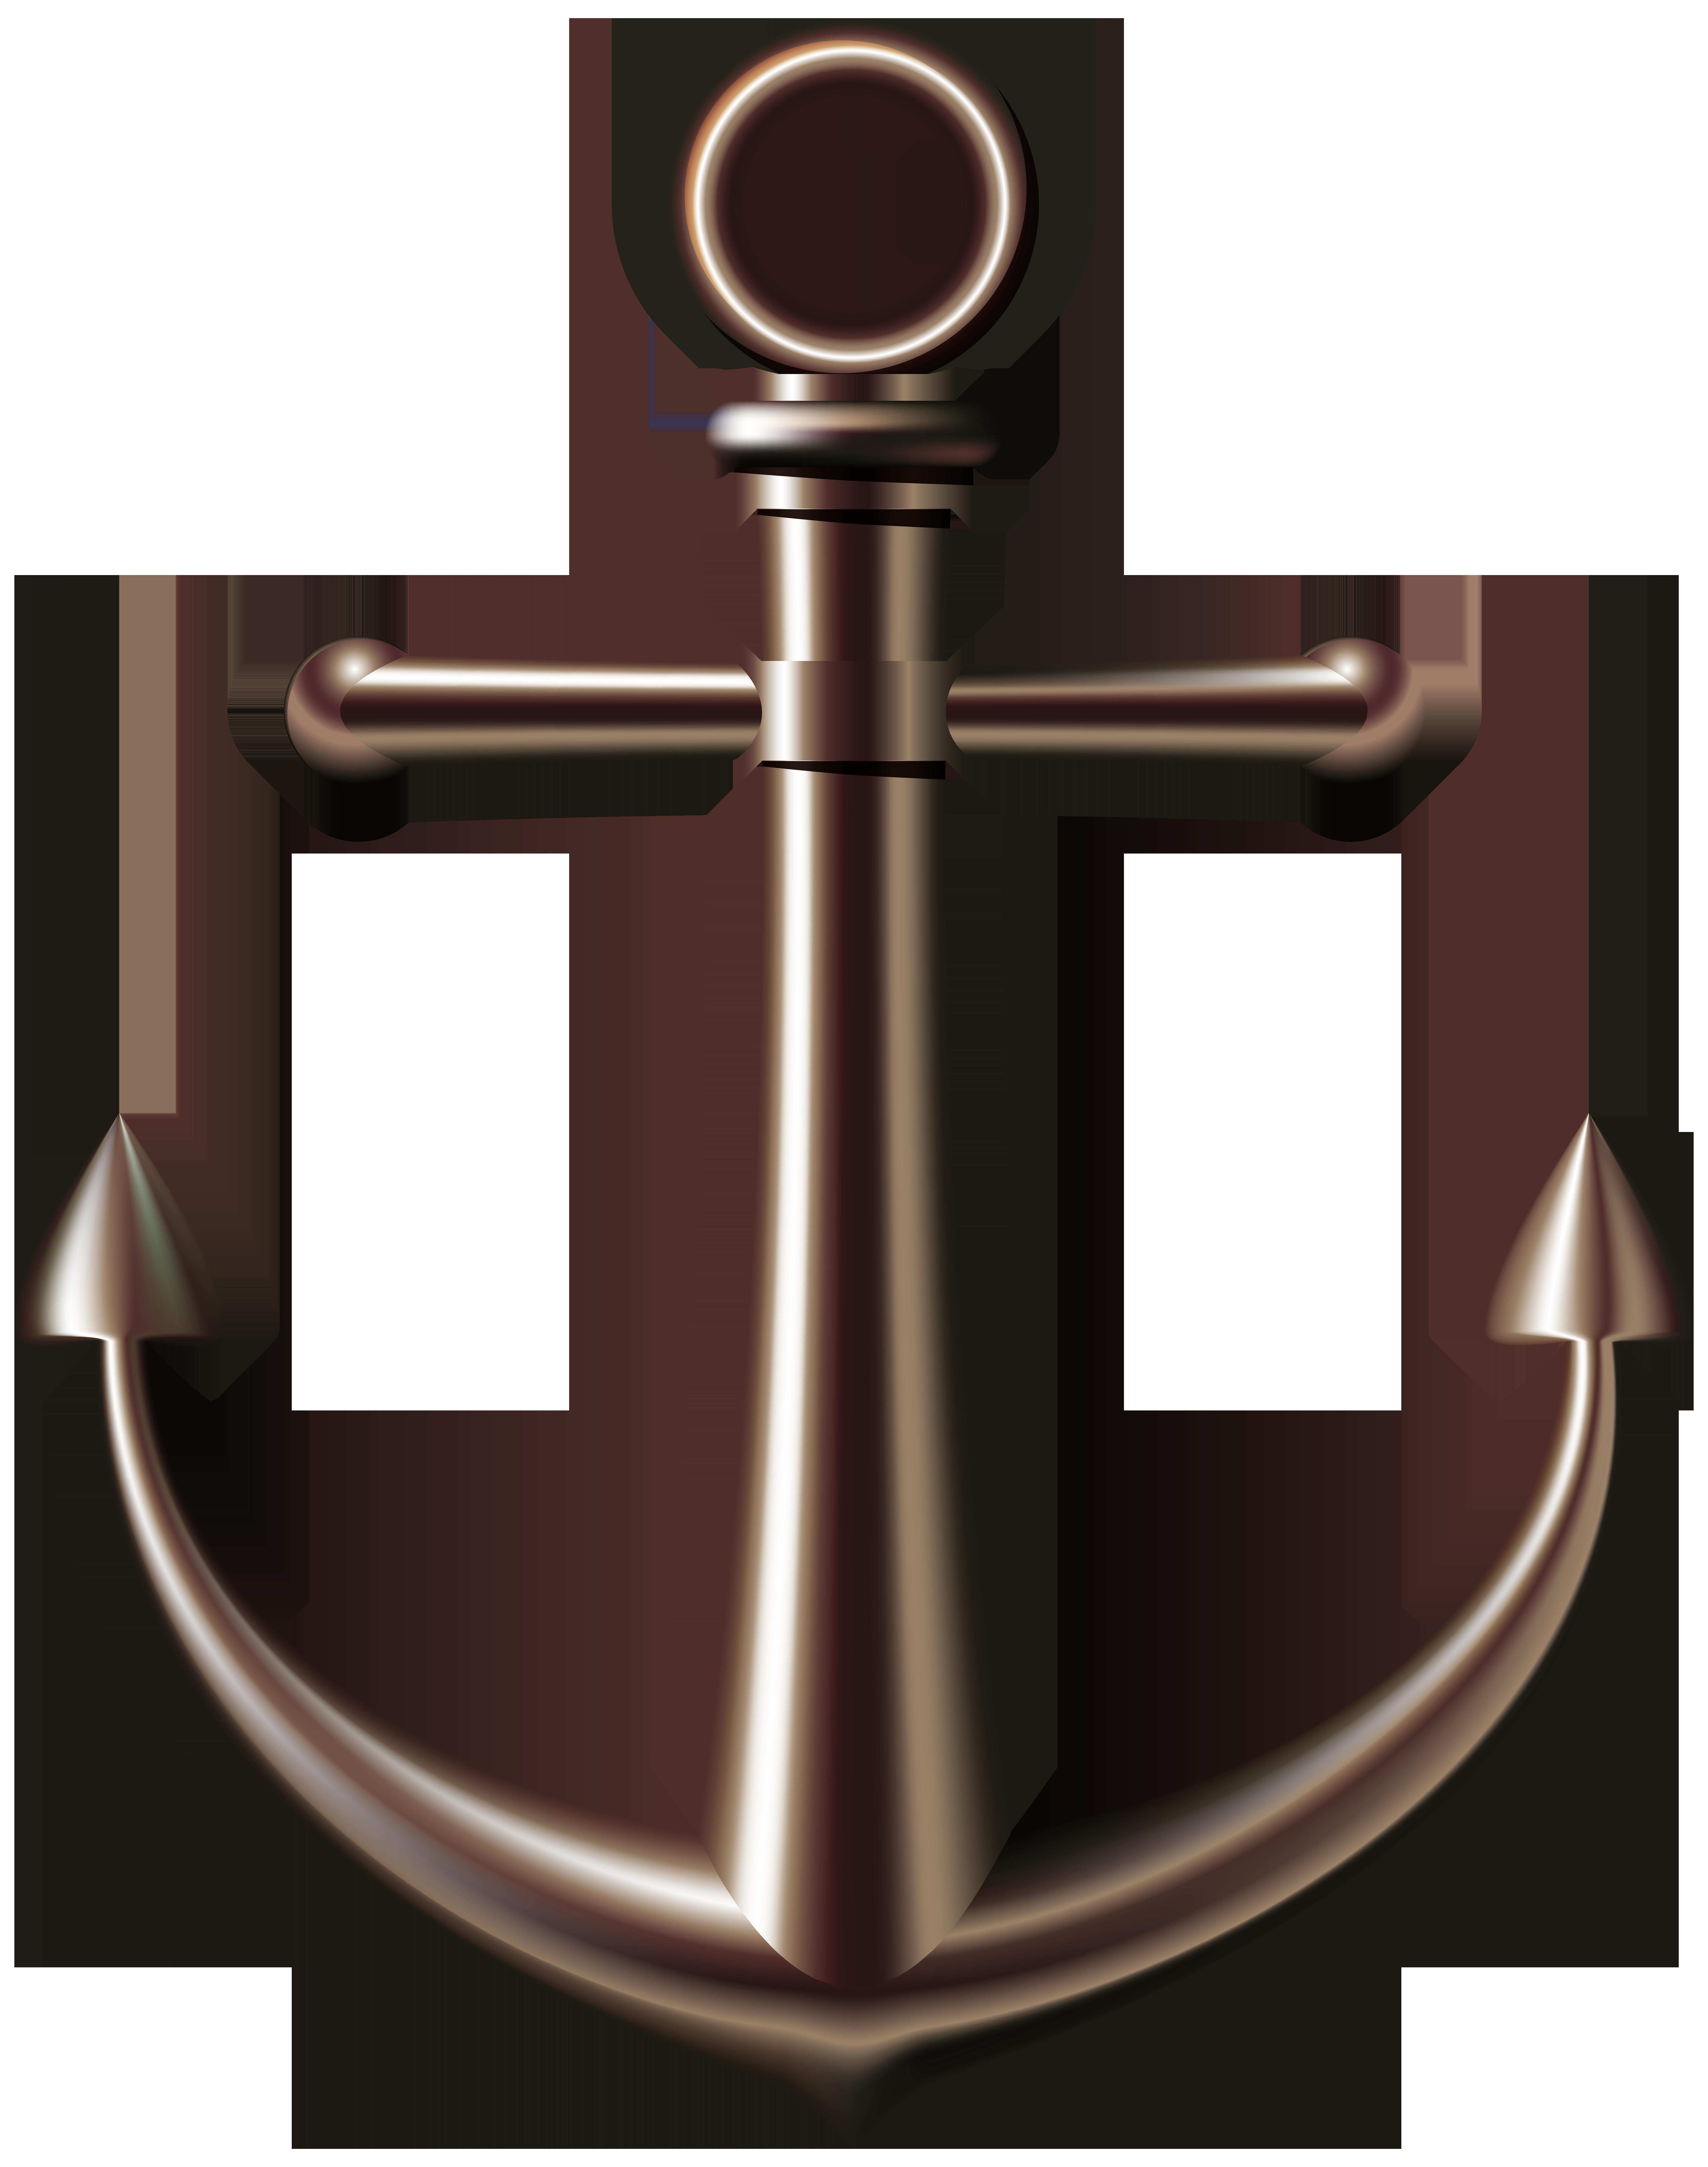 Anchor clipart. Metal at getdrawings com